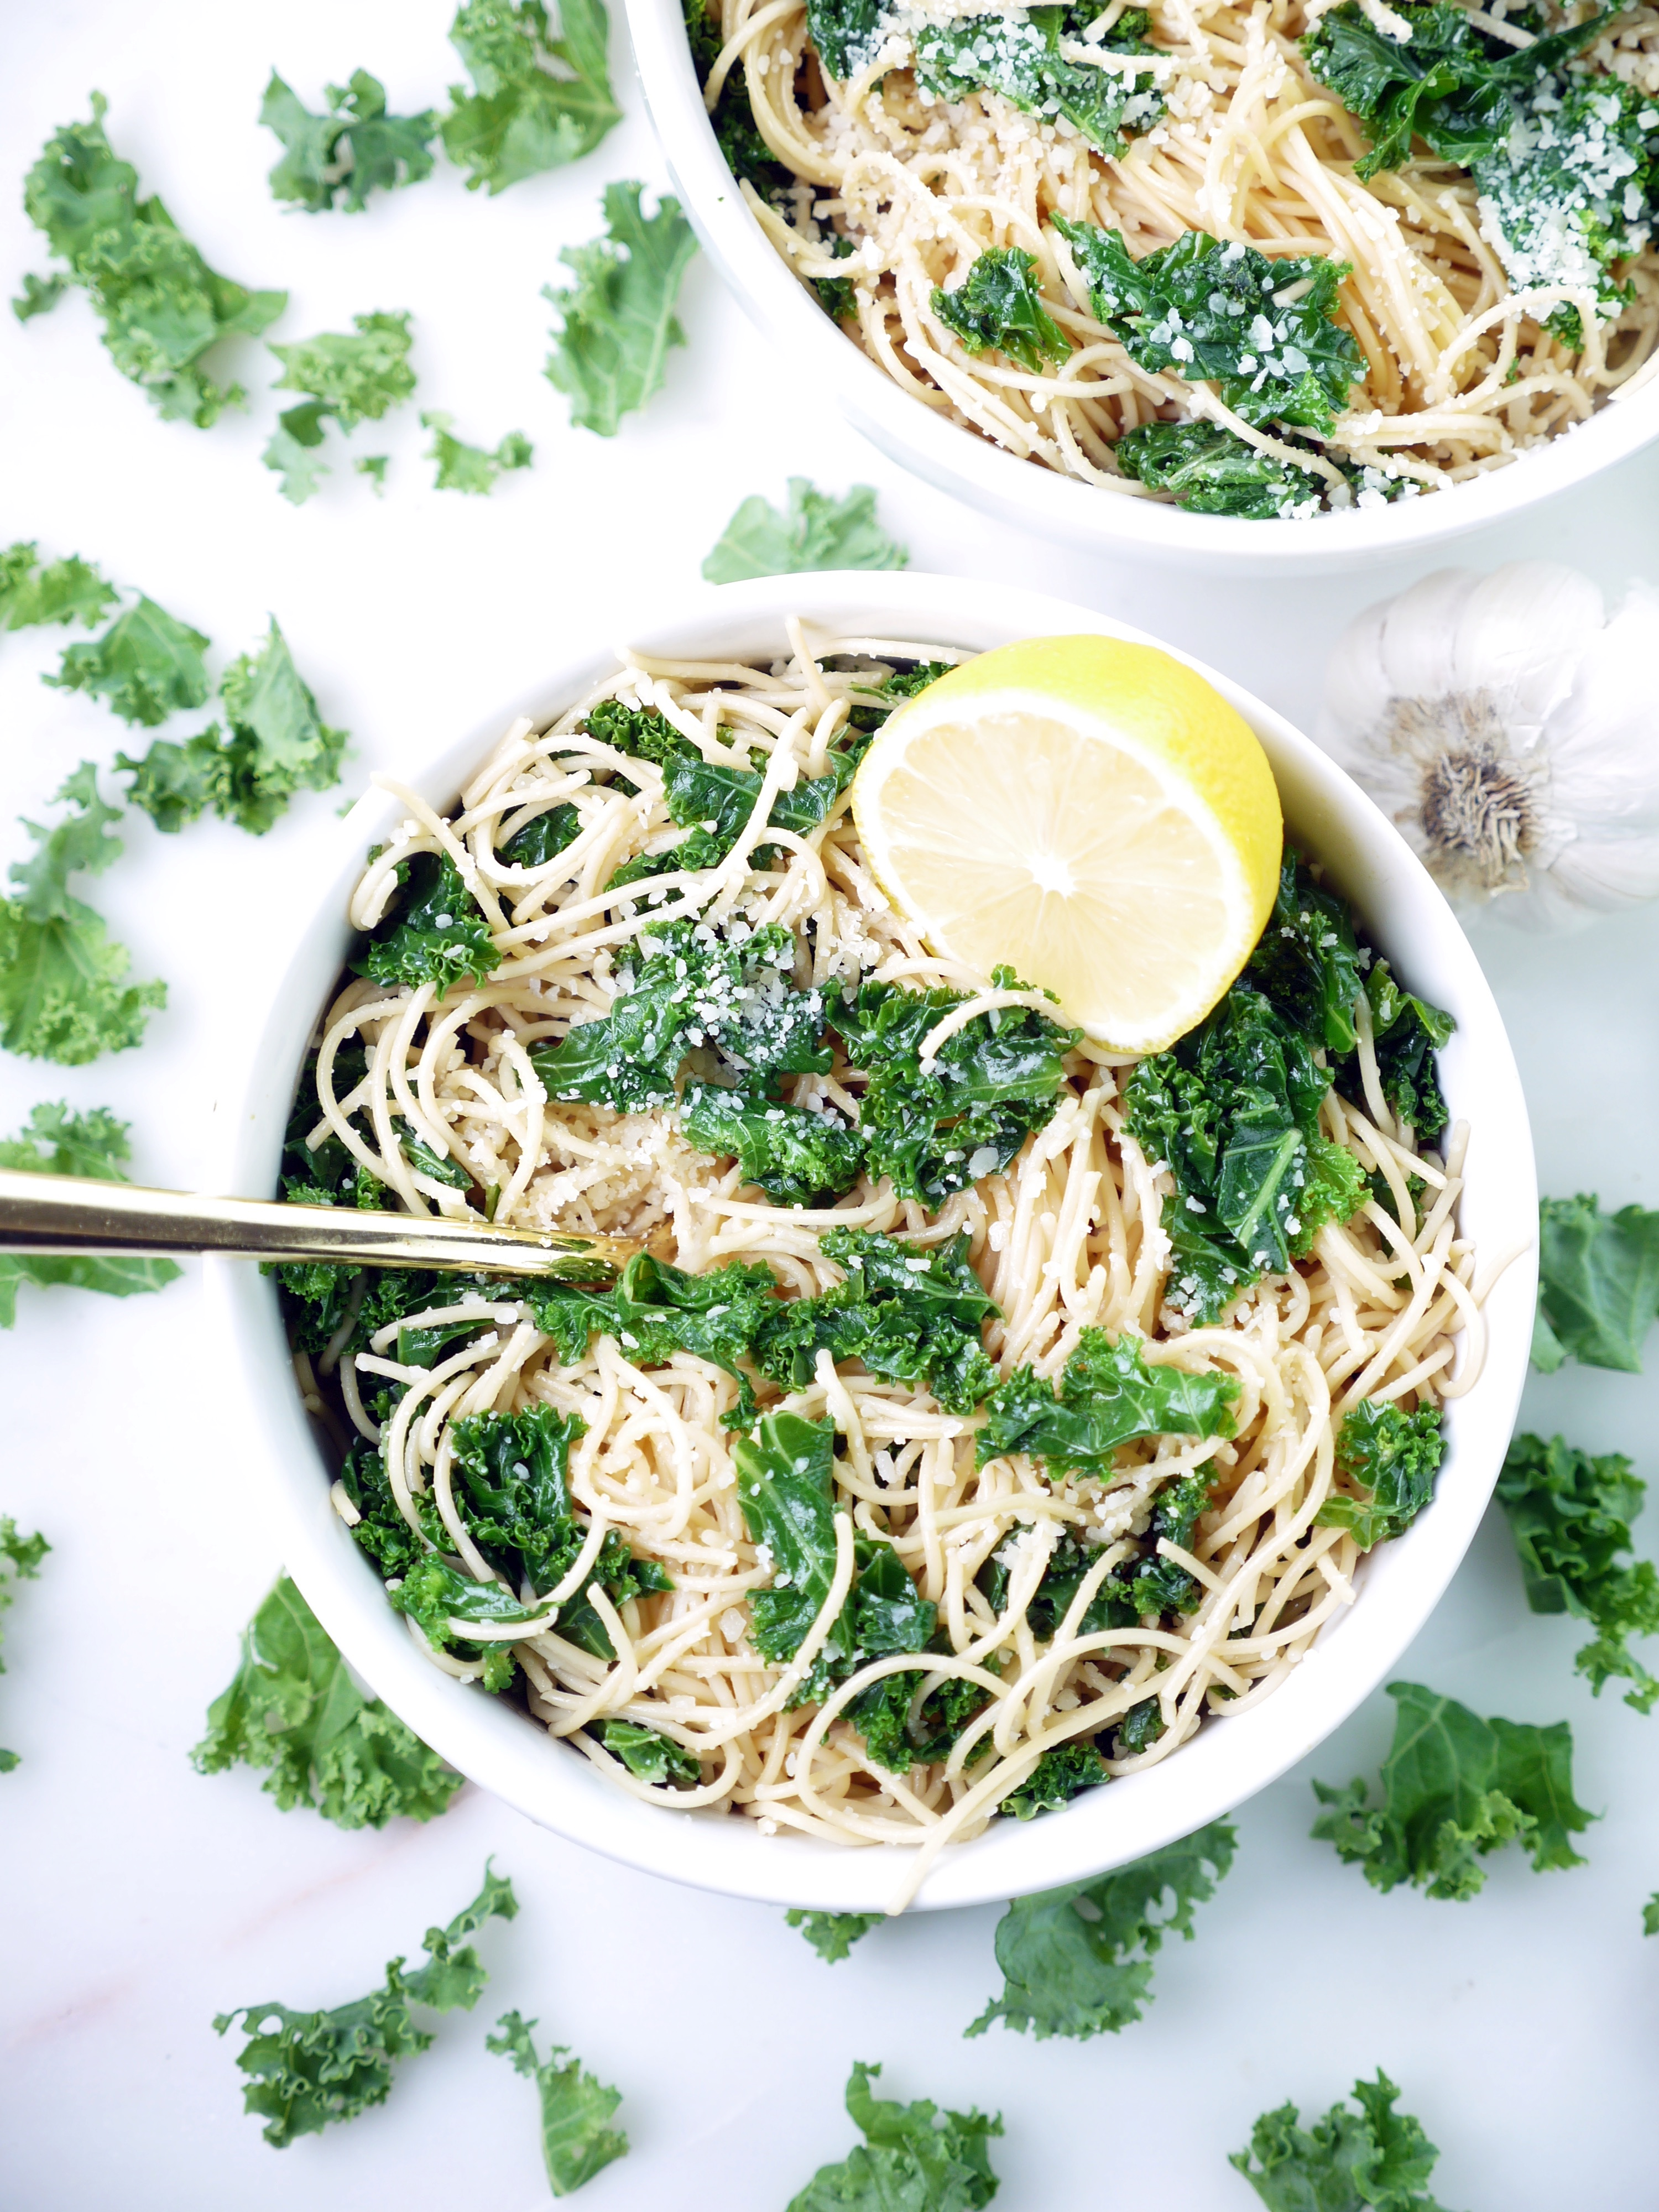 Lemony Parmesan Kale Chickpea Pasta